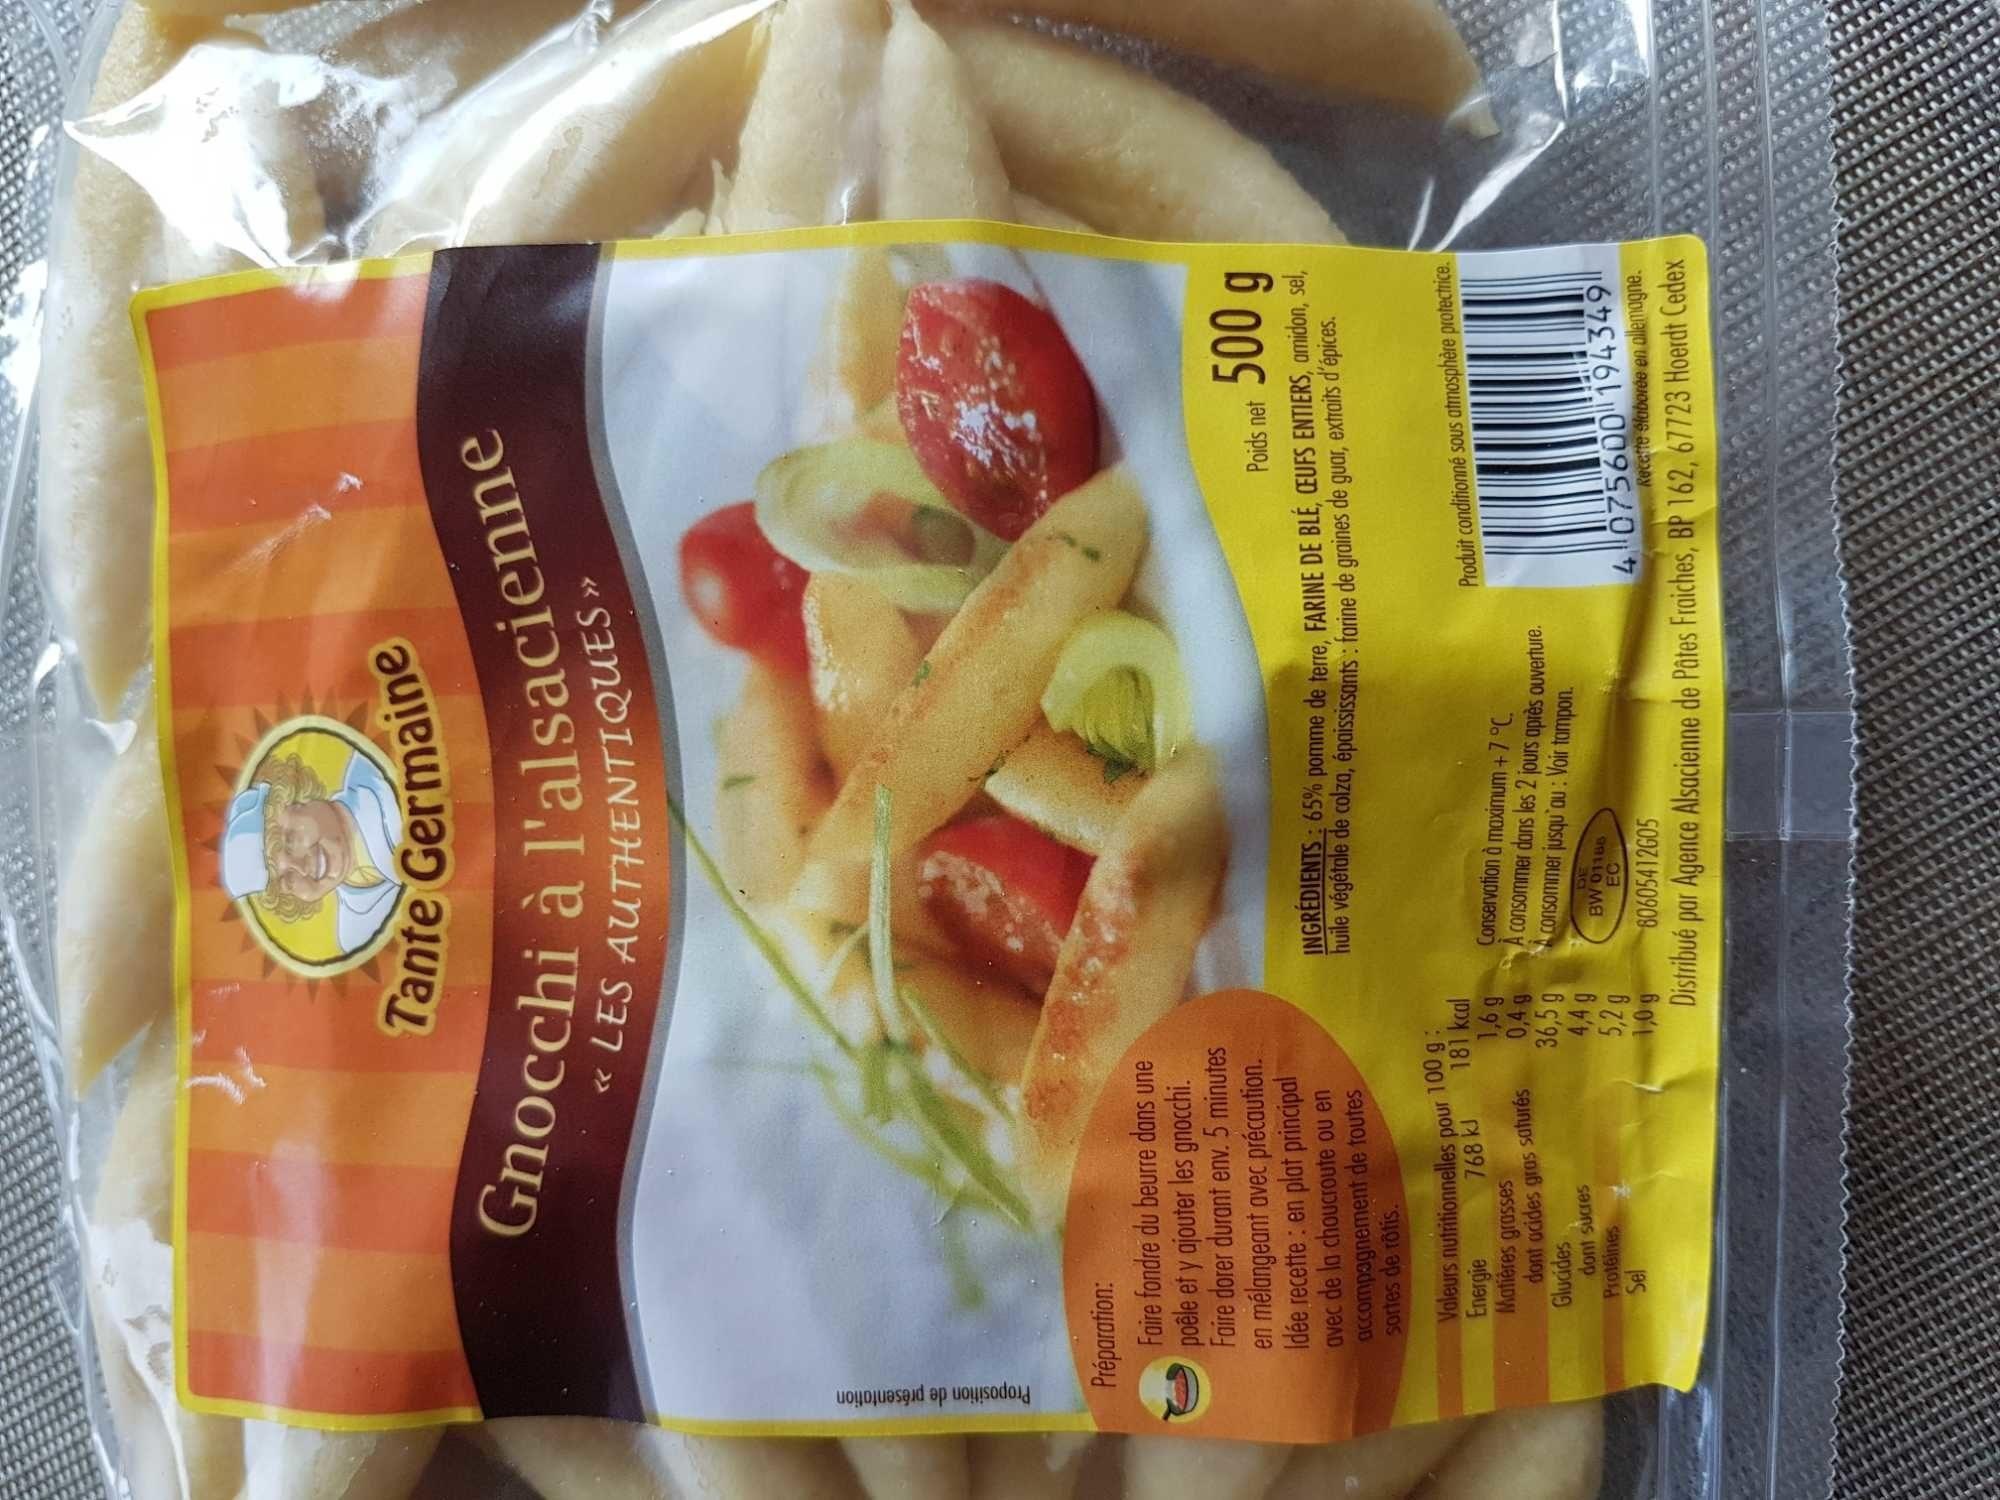 Gnocchi a l'alsacienne - Product - fr